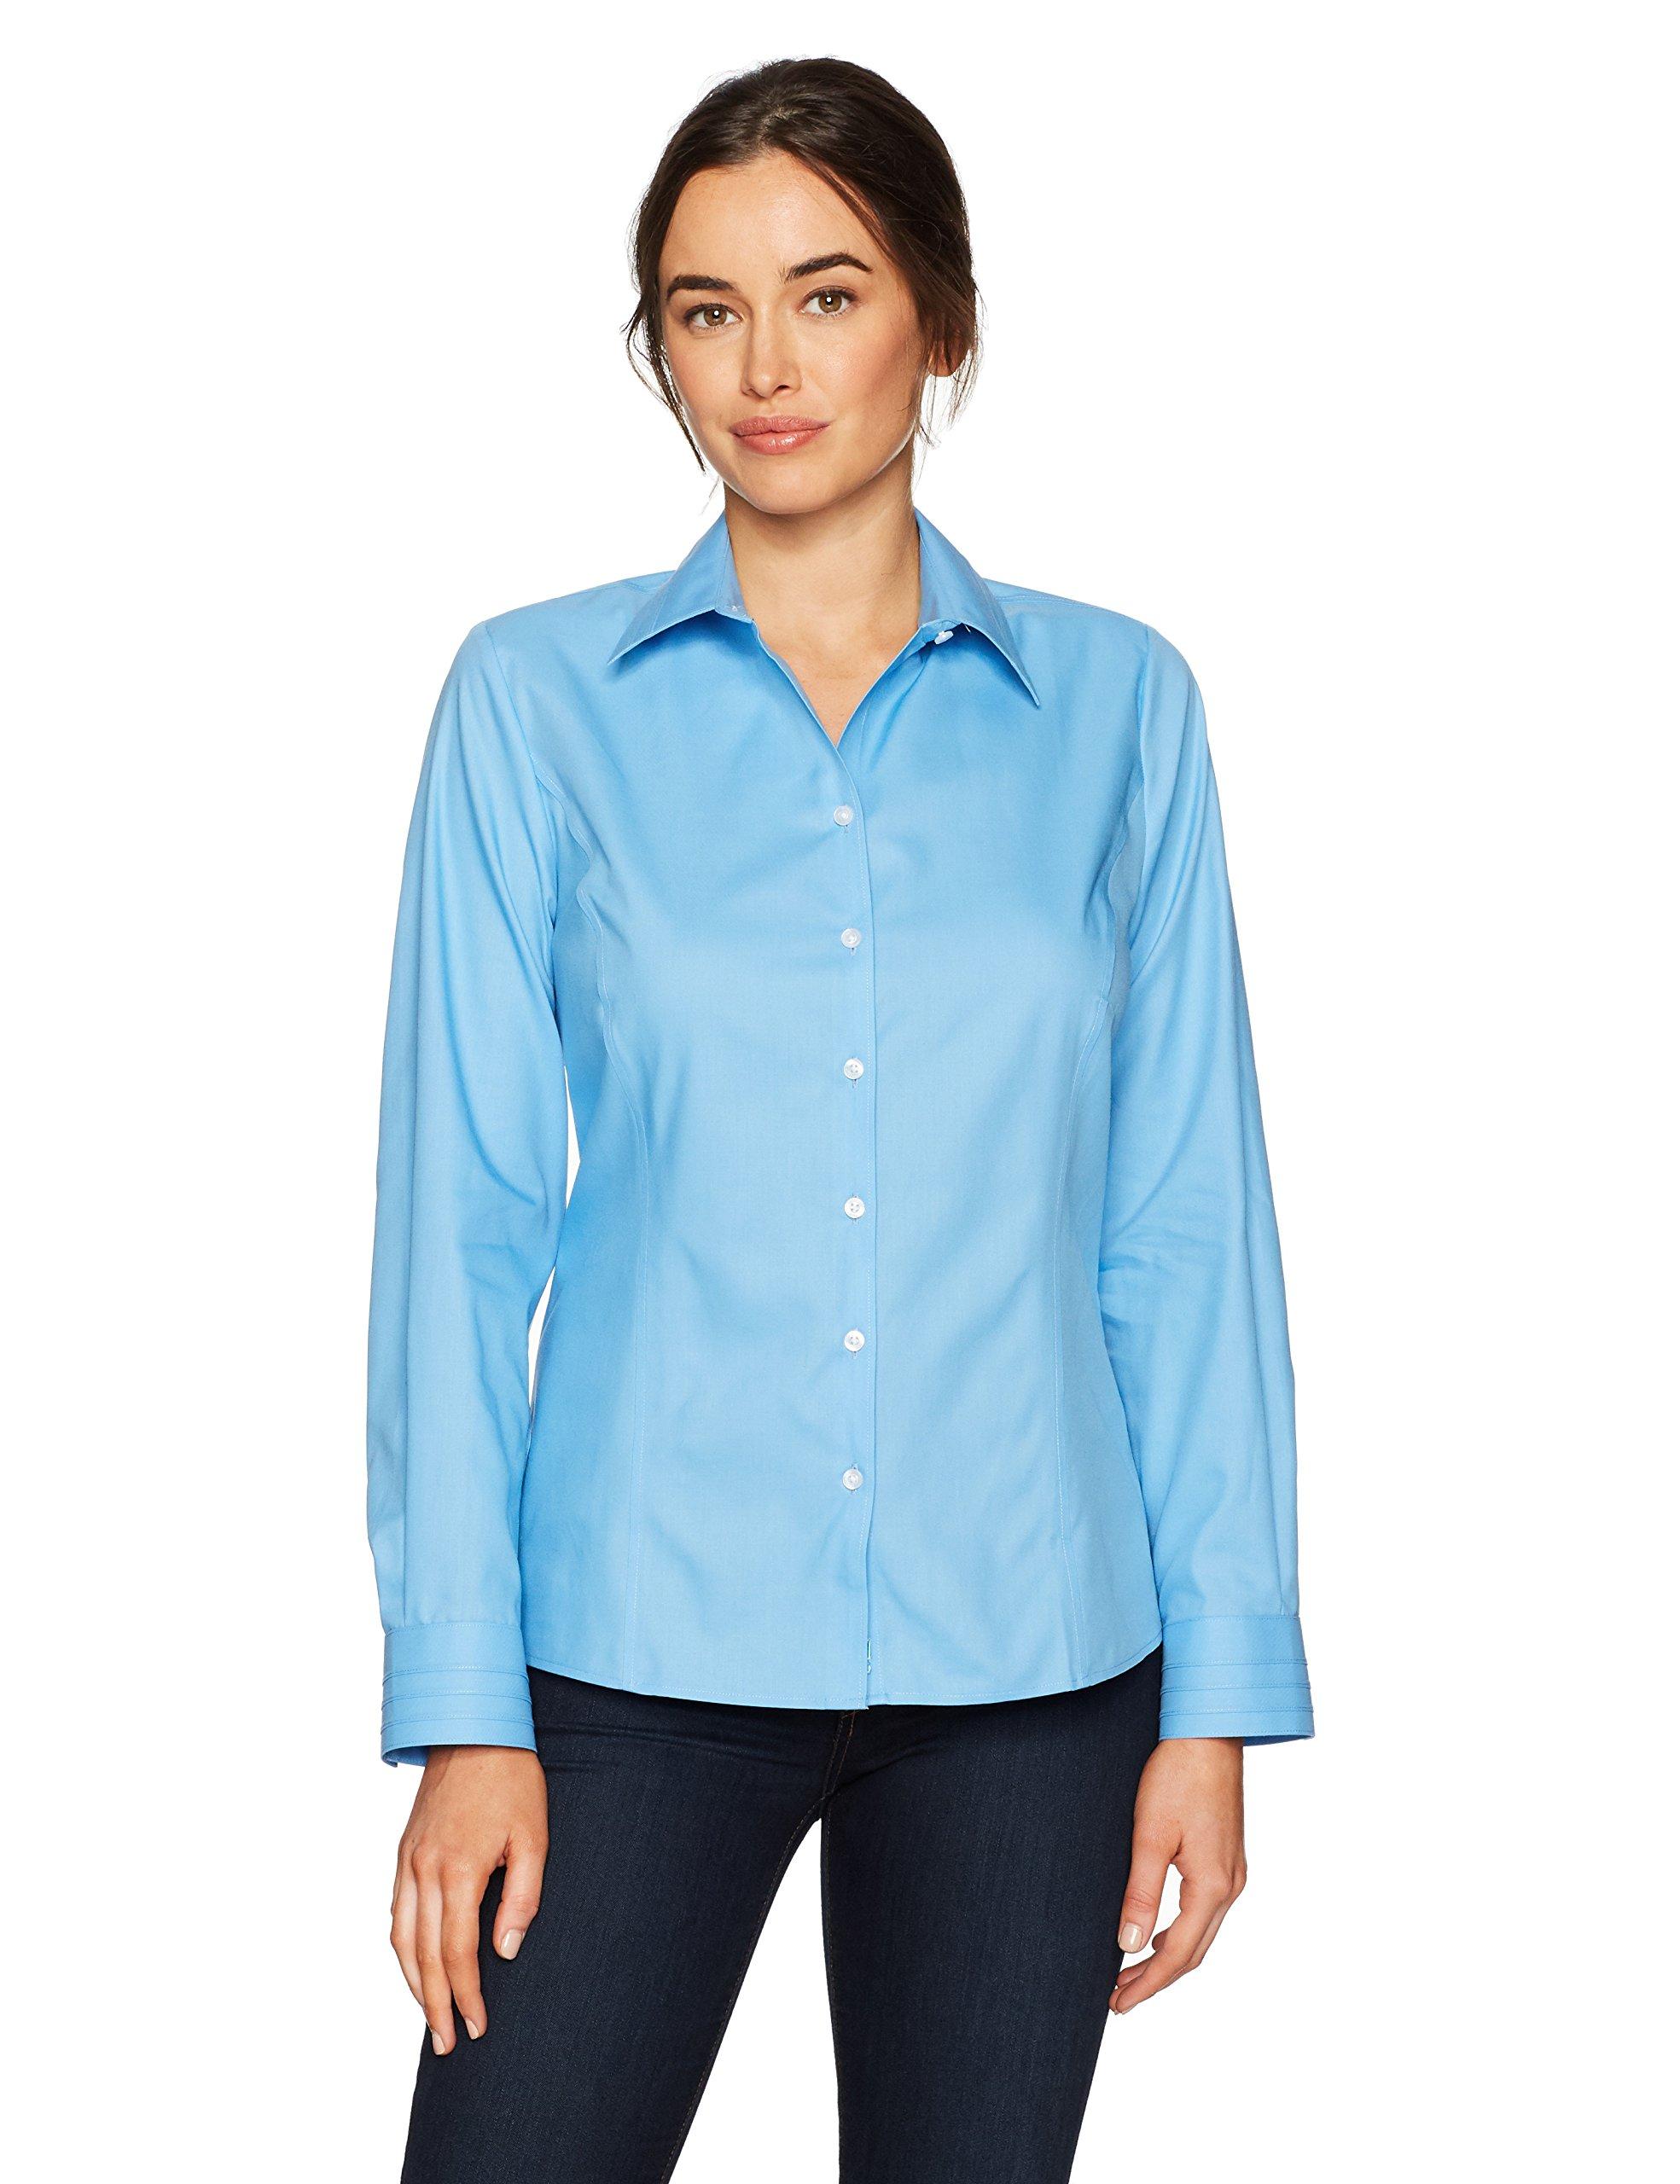 Cutter & Buck Women's Epic Easy Care Long Sleeve Fine Twill Collared Shirt, Atlas, XL